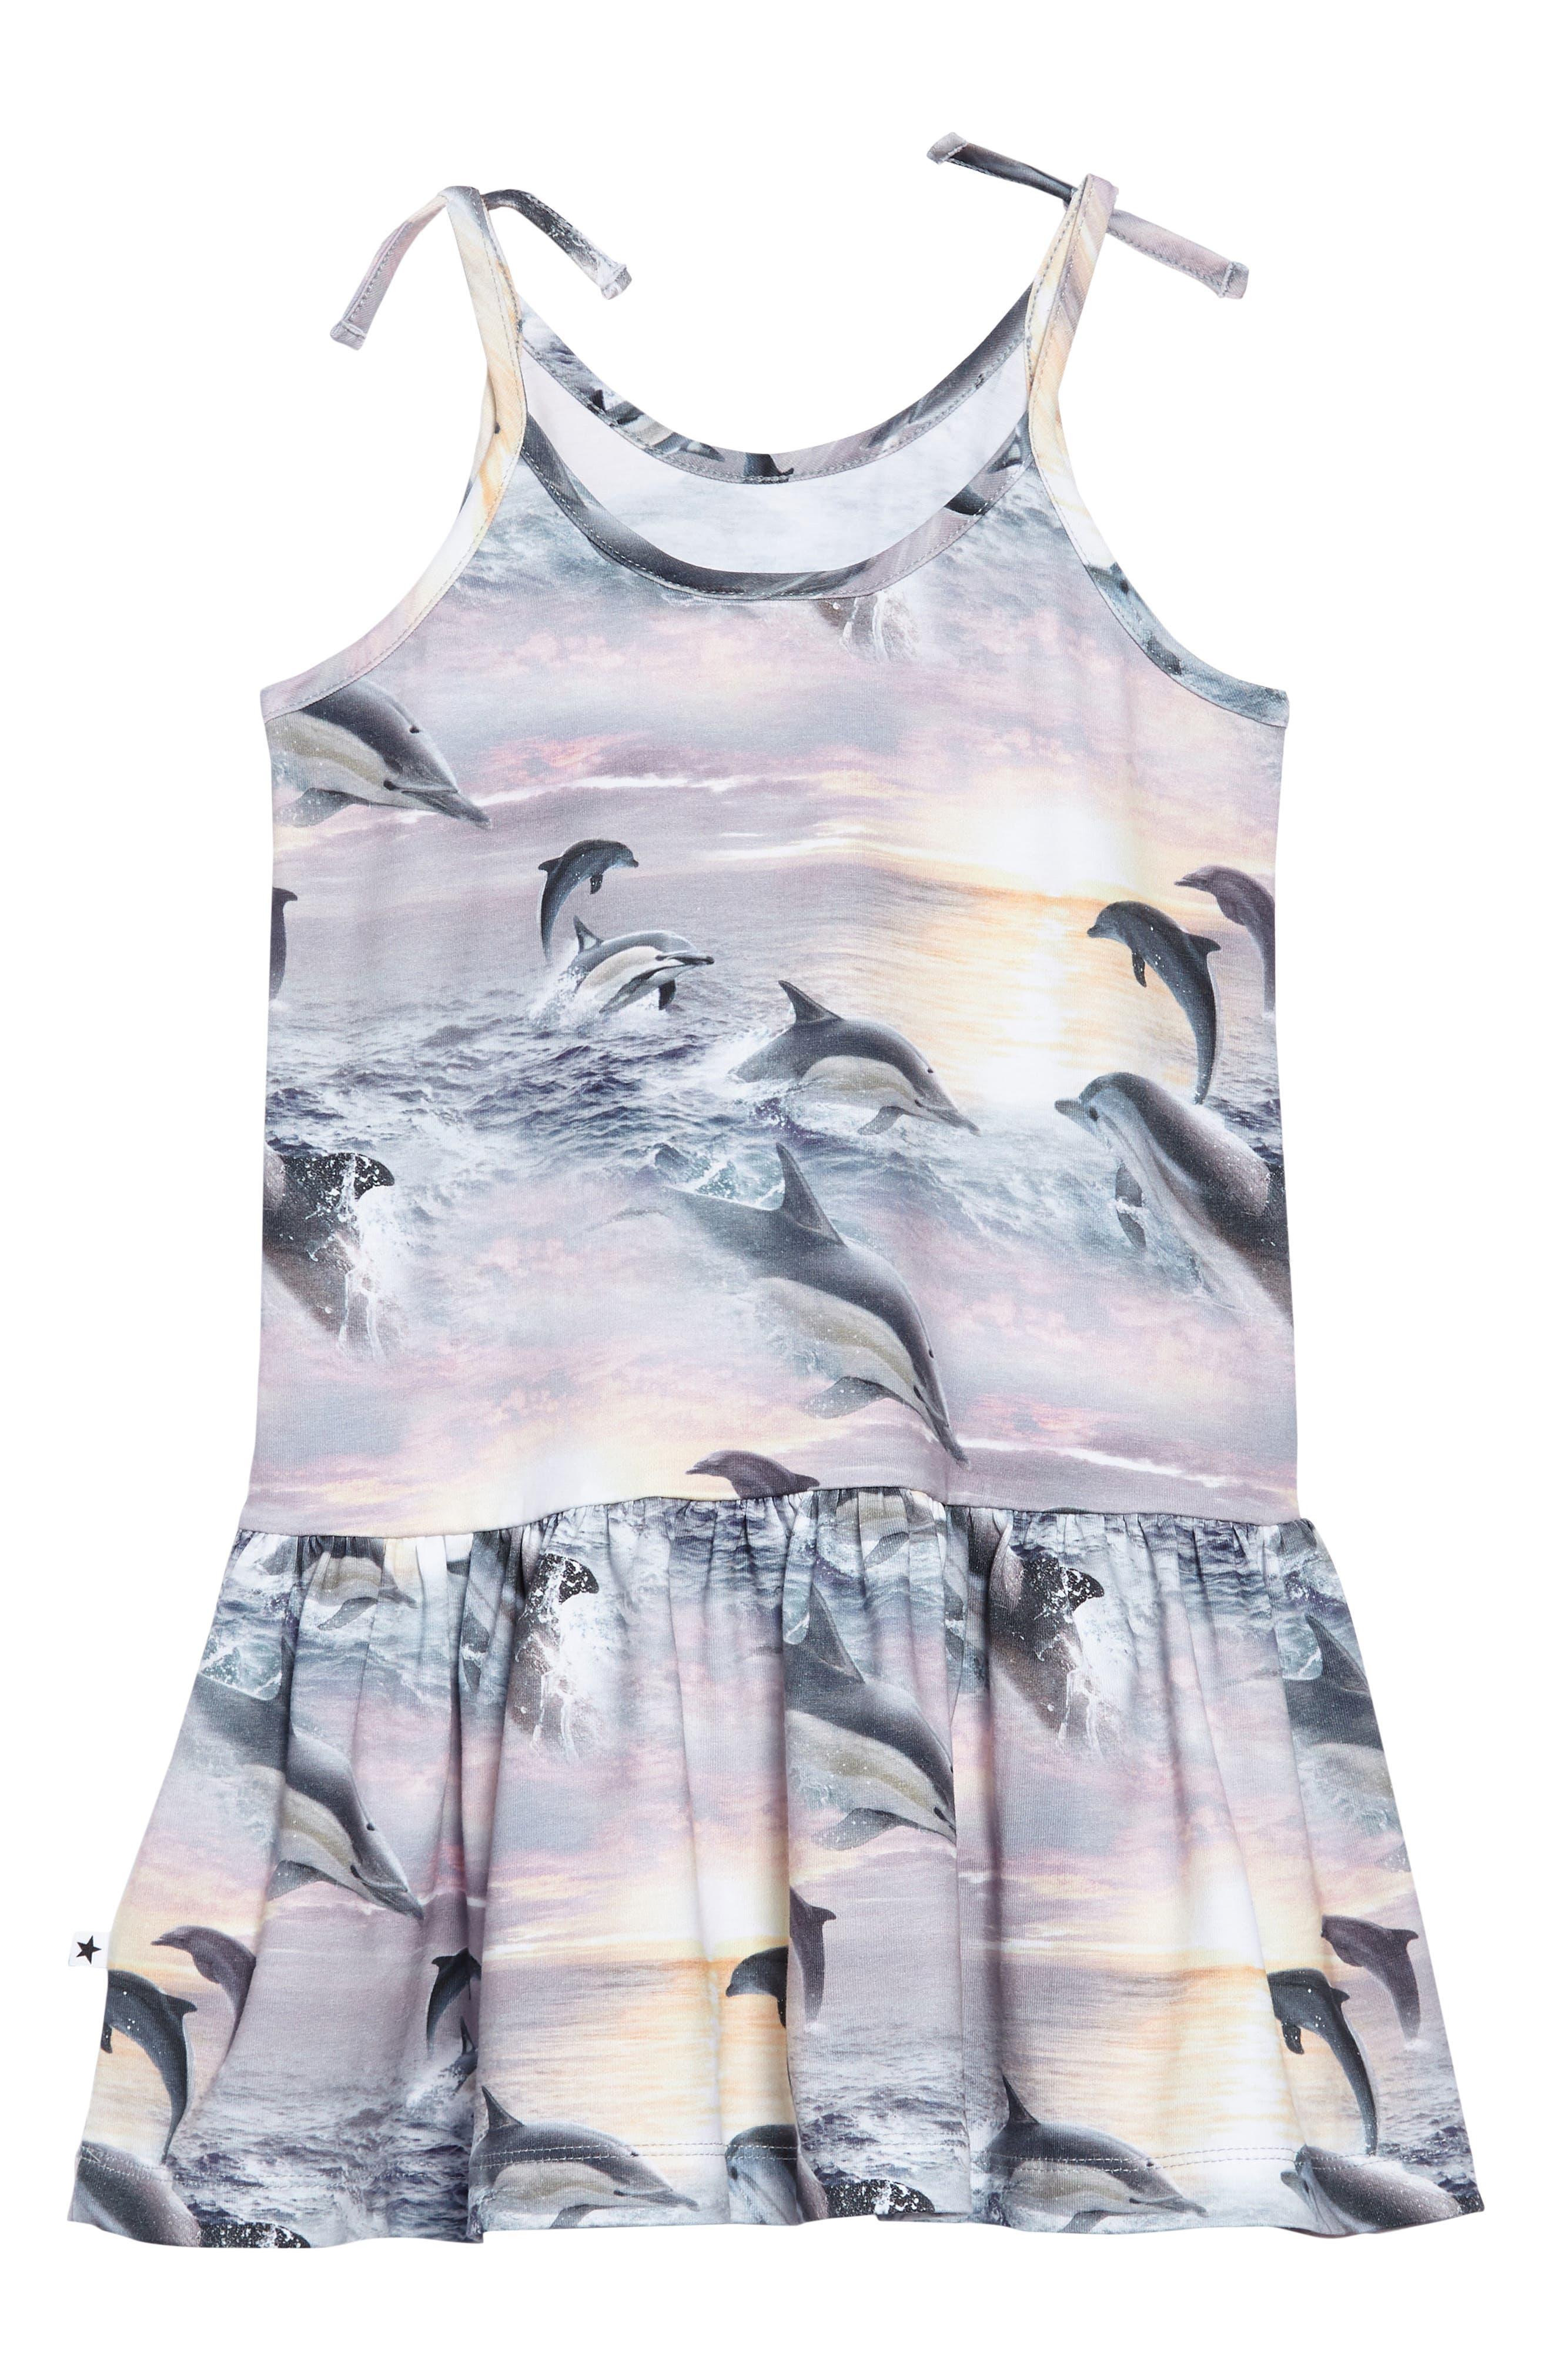 Camilla Dolphin Dress,                             Alternate thumbnail 2, color,                             DOLPHIN SUNSET